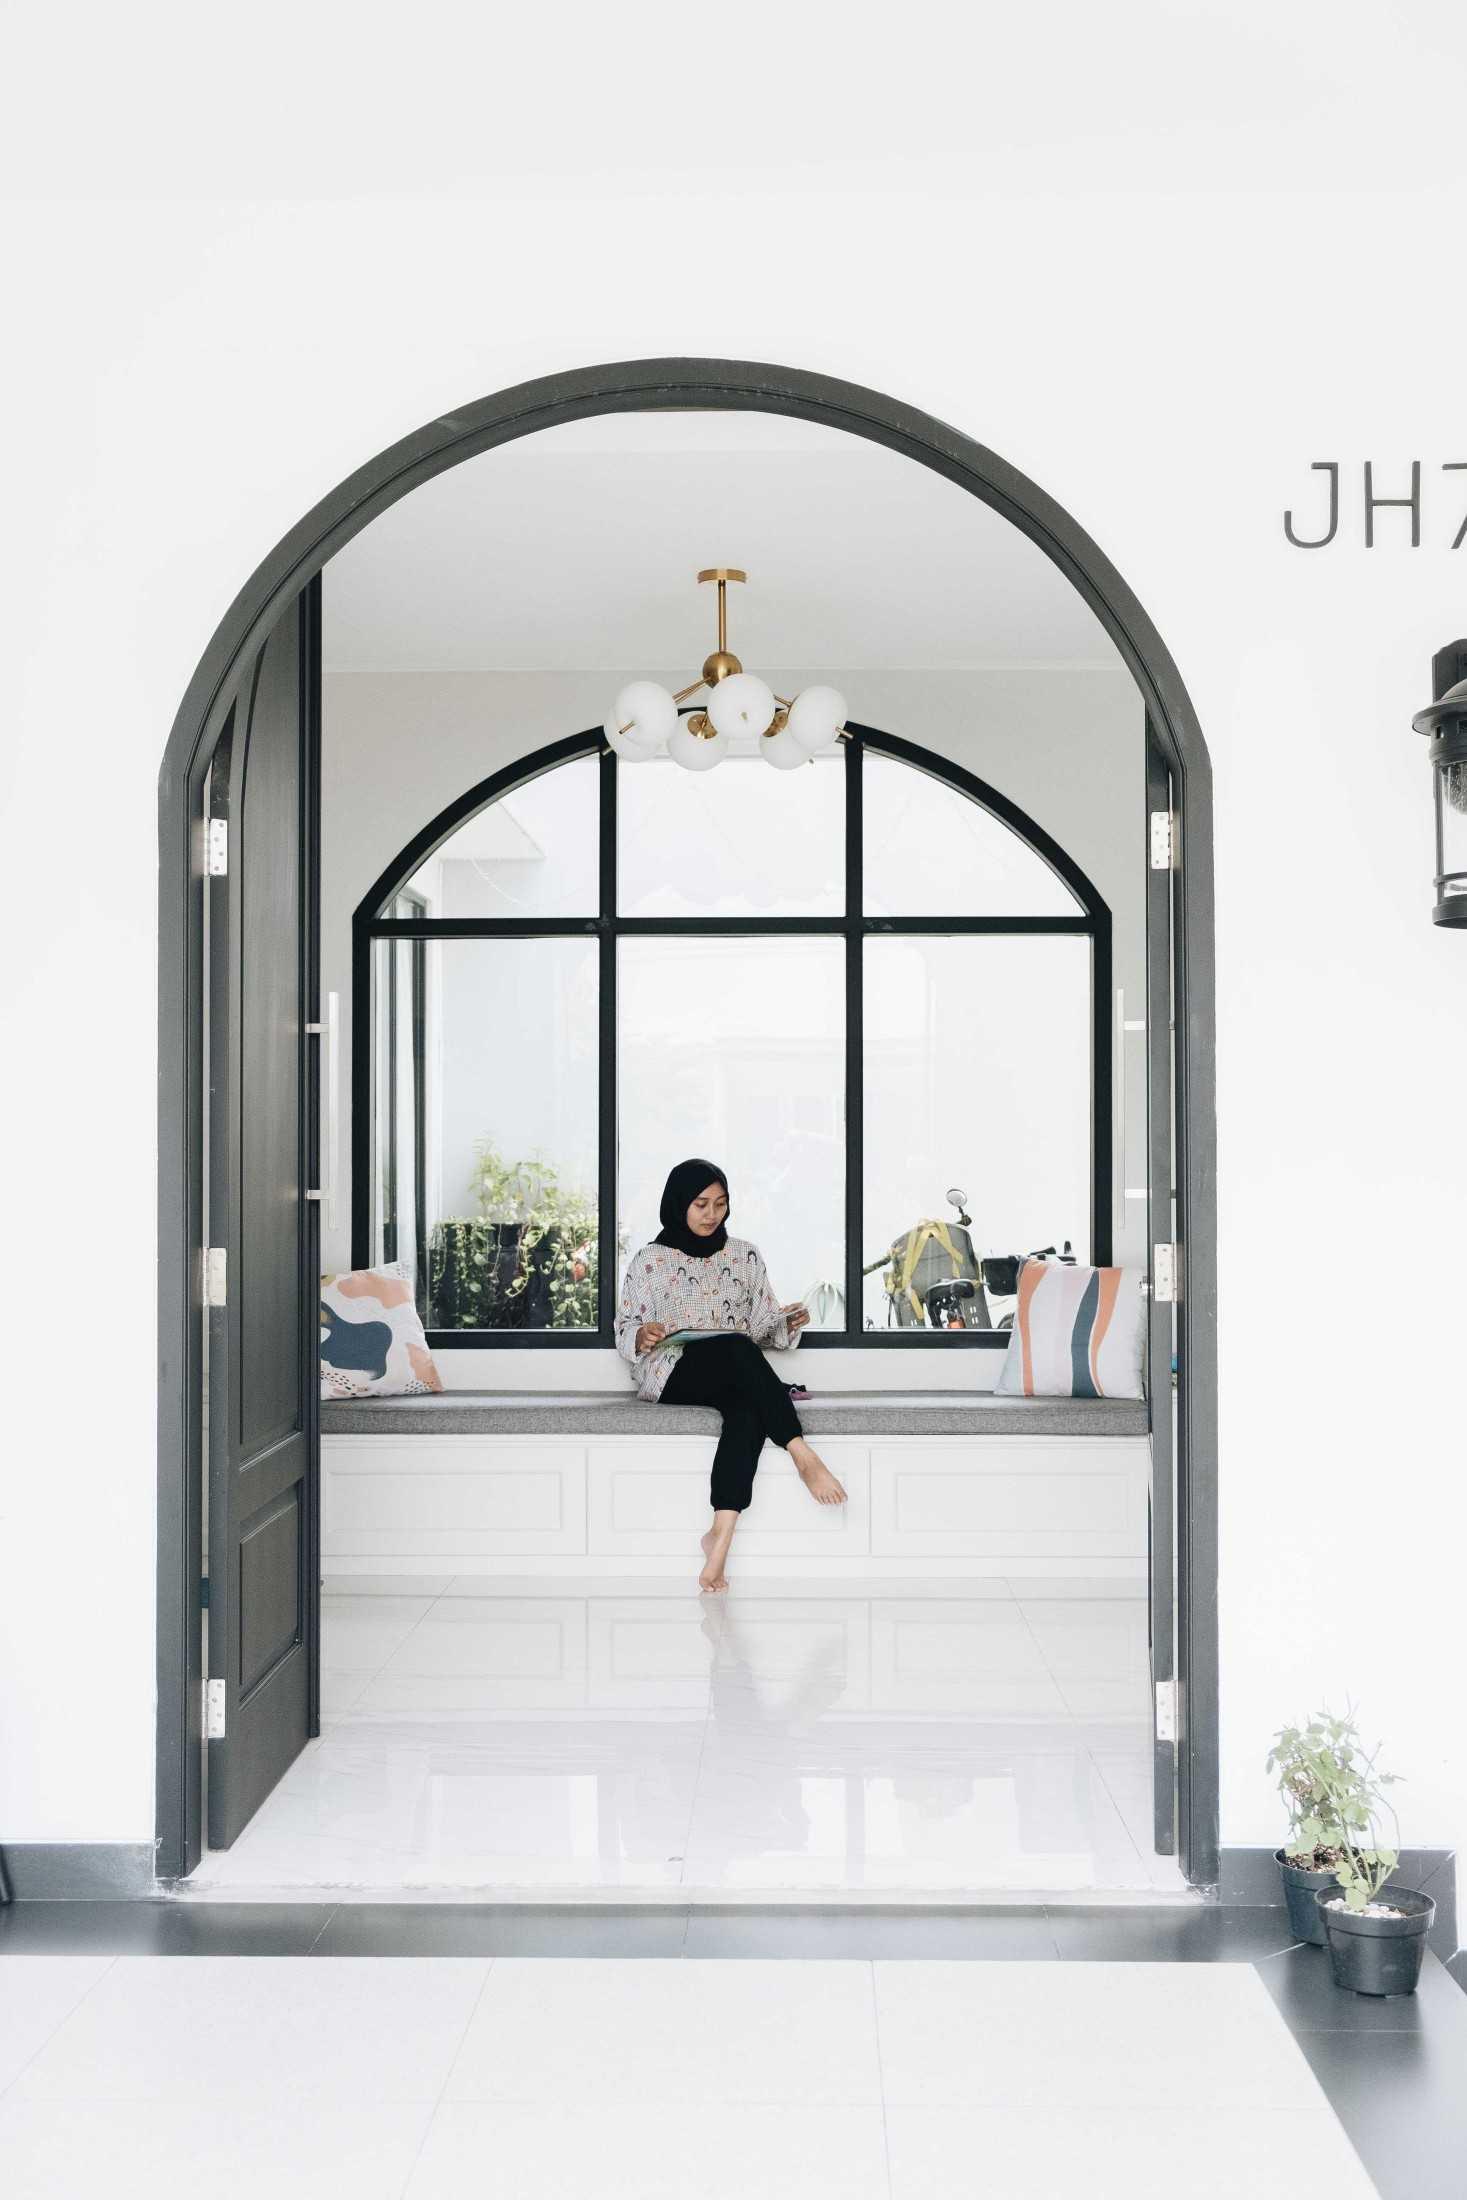 Kad Firma Arsitektur Rumah Clayu Jakarta, Daerah Khusus Ibukota Jakarta, Indonesia Jakarta, Daerah Khusus Ibukota Jakarta, Indonesia Rumah Clayu - Entrance Classic 127670